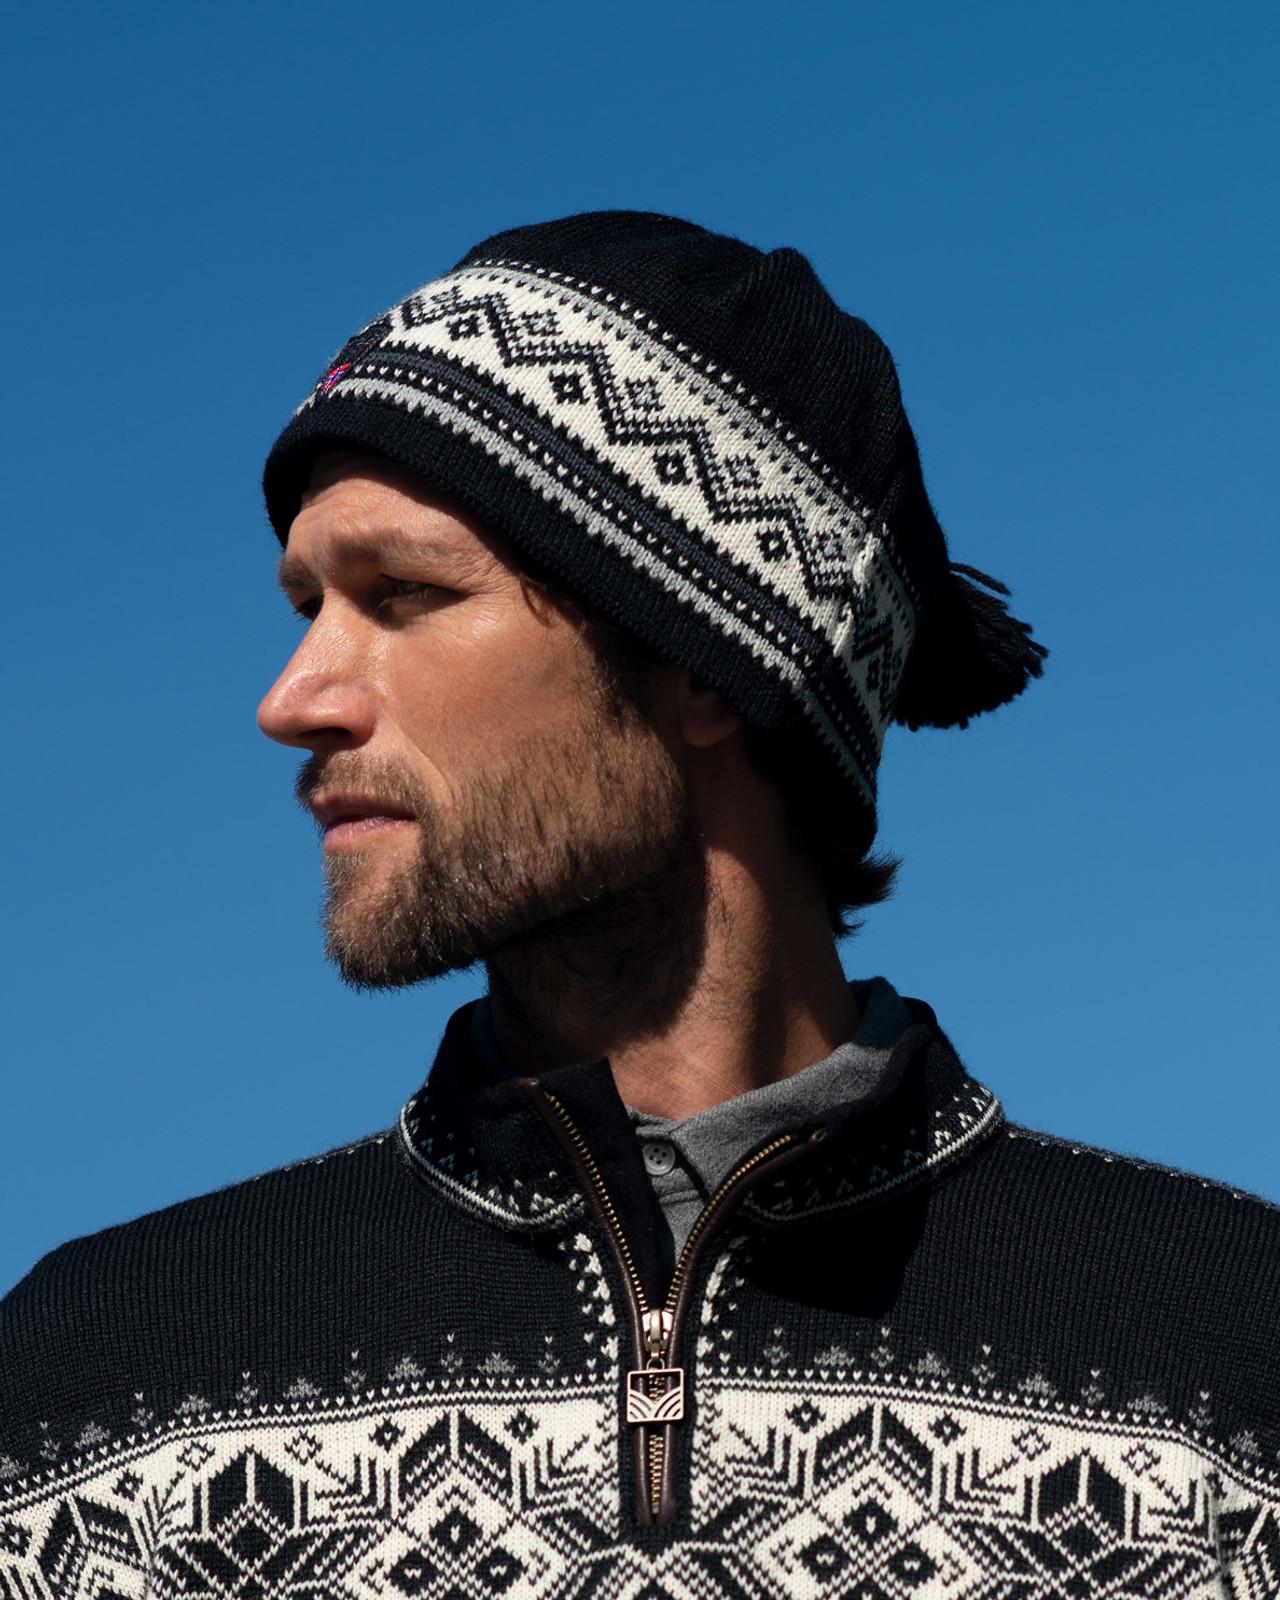 Dale of Norway Vail Unisex Hat in Black/Dark Grey/Metal/Off White, 40331-F